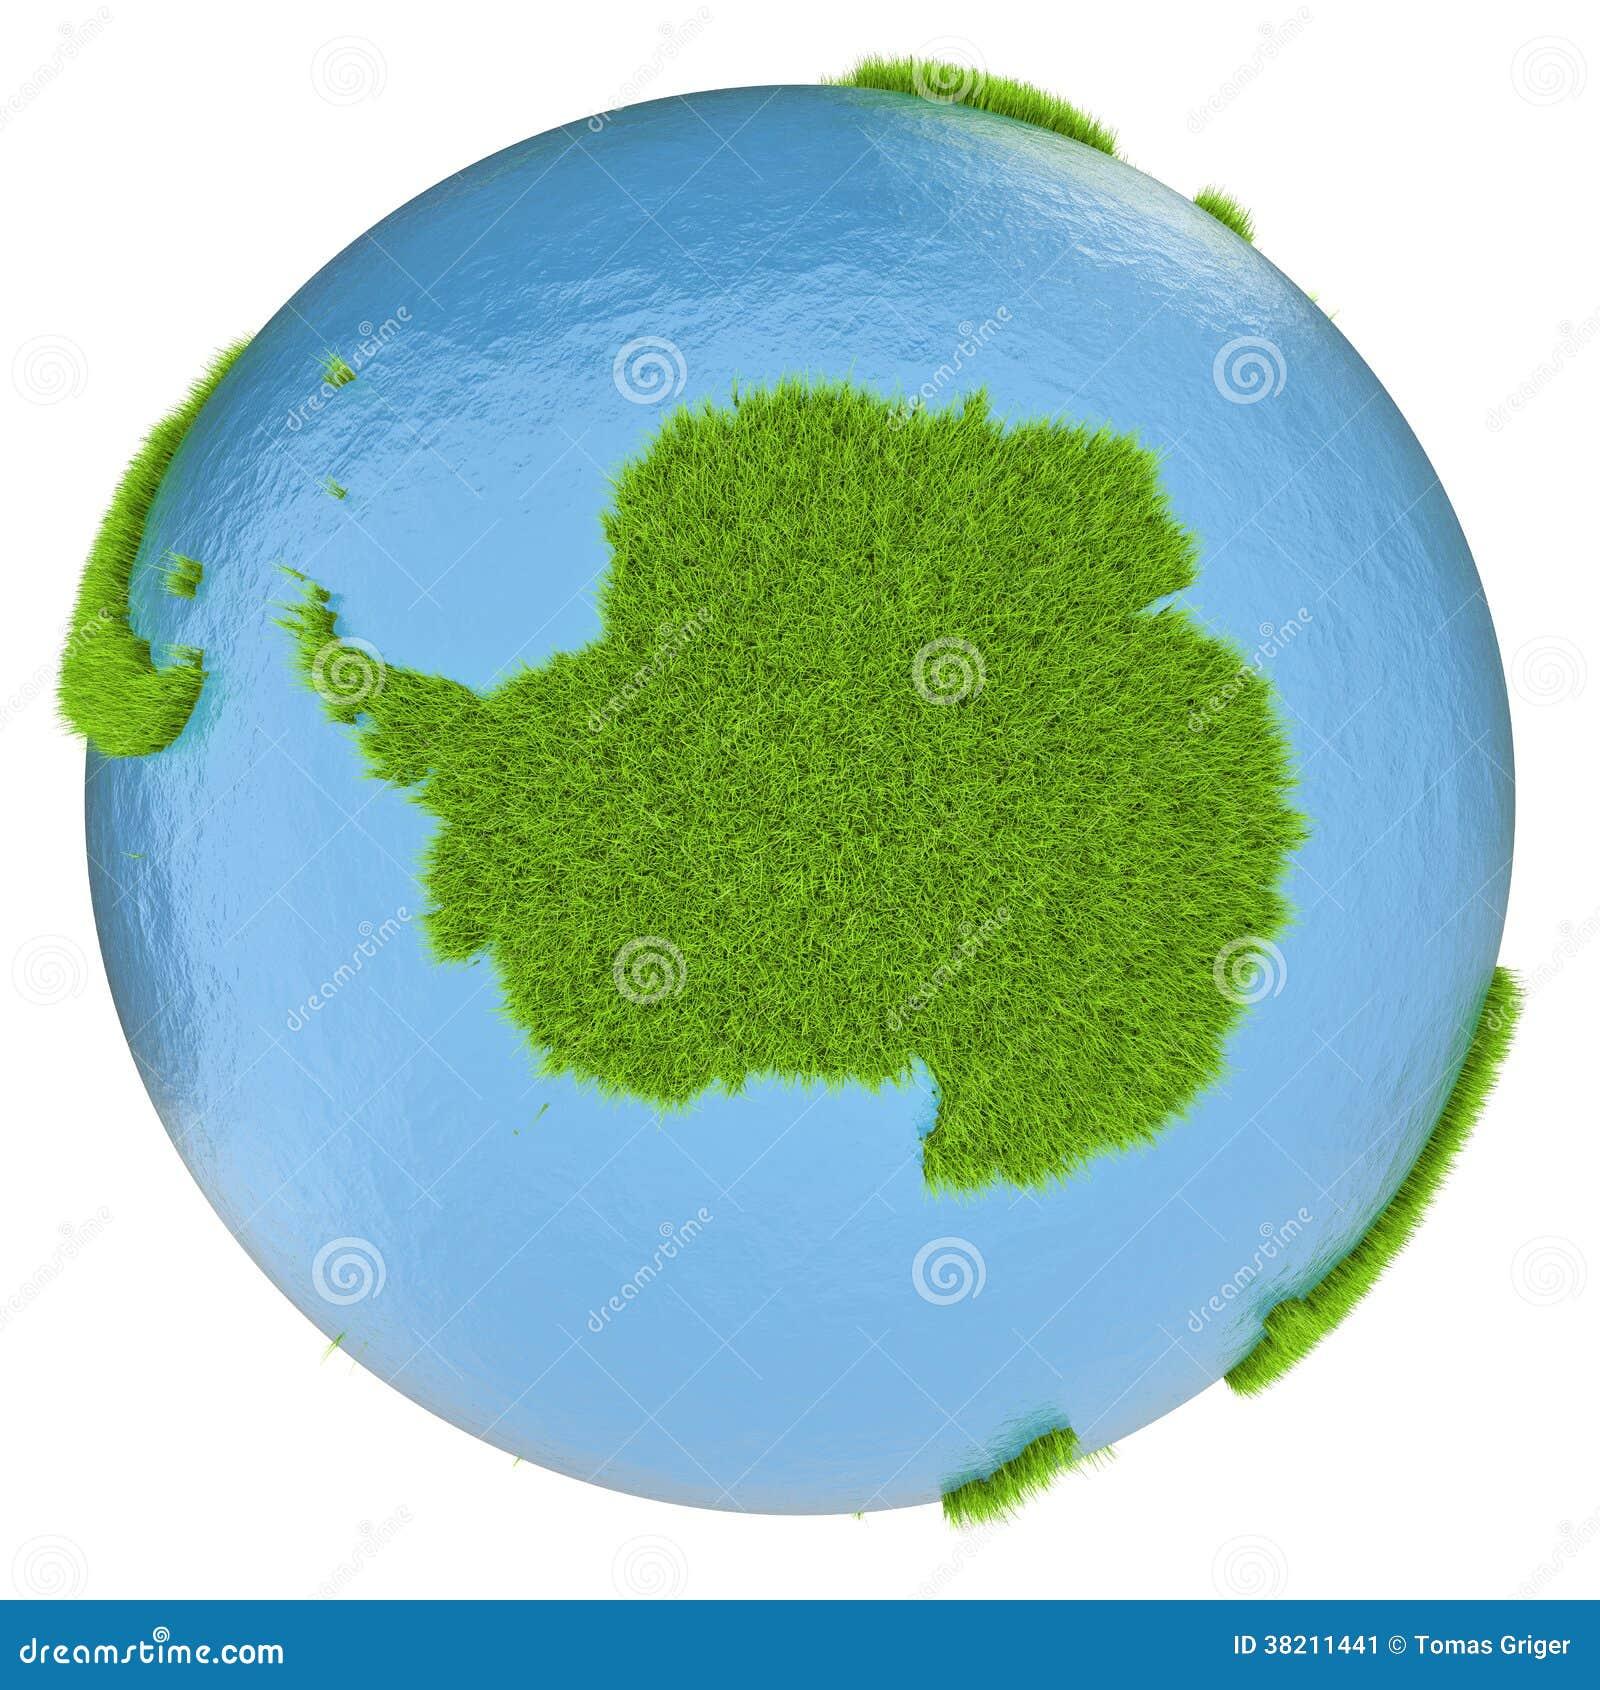 Antarctica on green planet